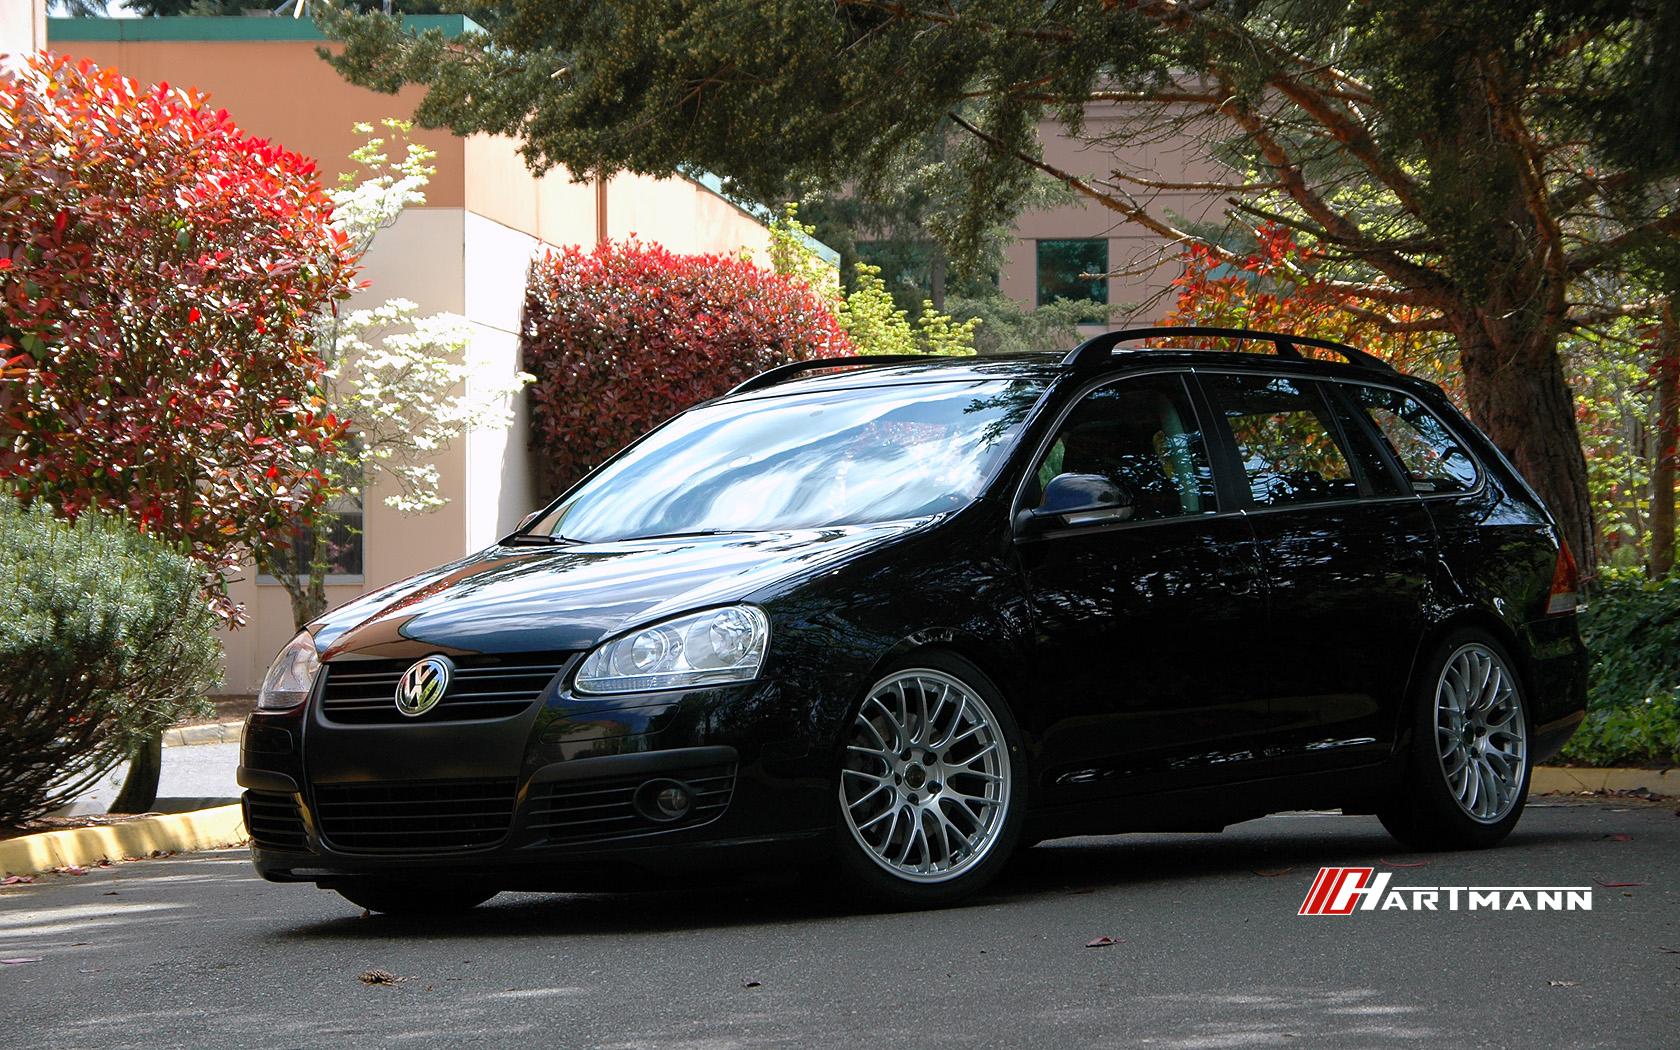 Vw mkv jsw hartmann wheels euromesh 4 gs 18 jp1 hwm